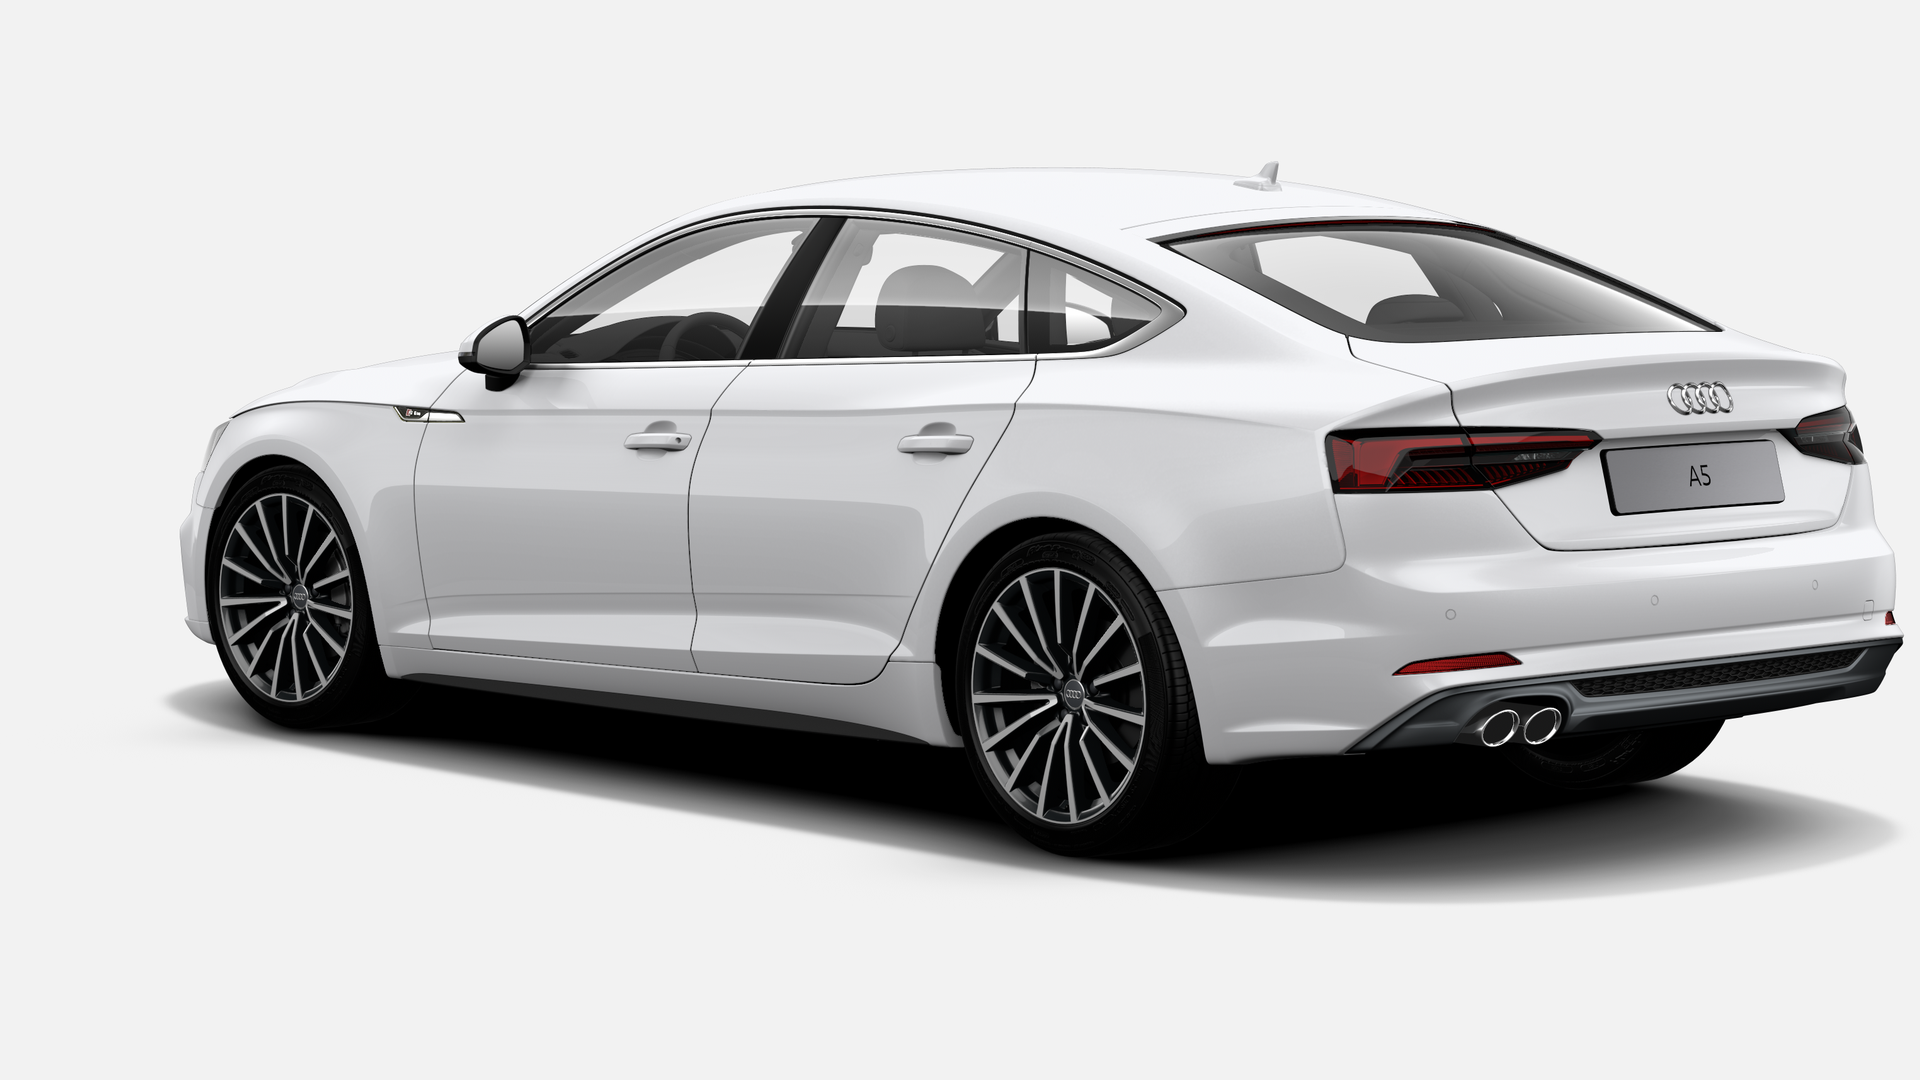 Vista Tres cuartos trasera izquierda de Audi A5 Sportback 40 TDI Sport S tronic 140 kW (190 CV)